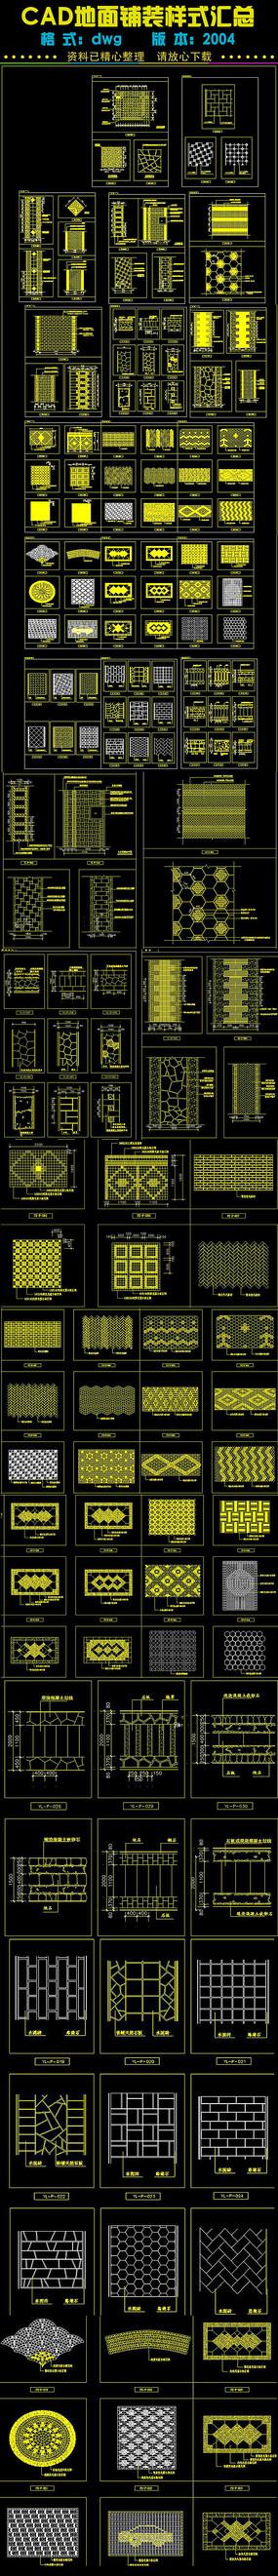 CAD地面铺装样式汇总